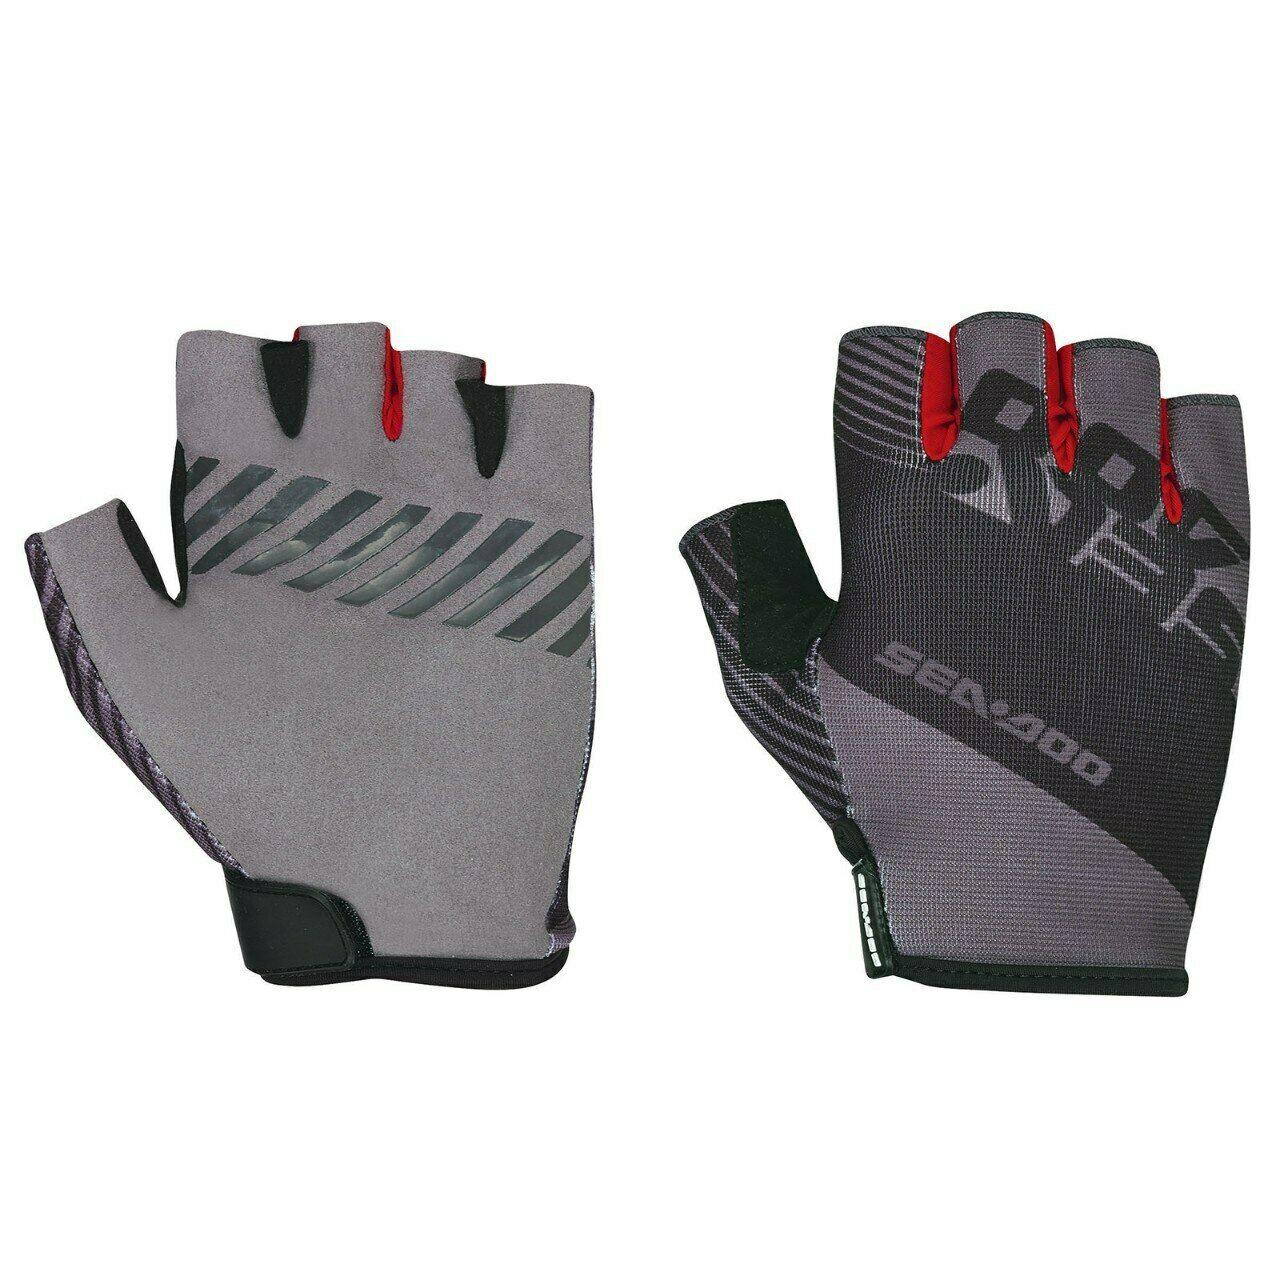 Guanti Sea Doo – Attitude shorty gloves